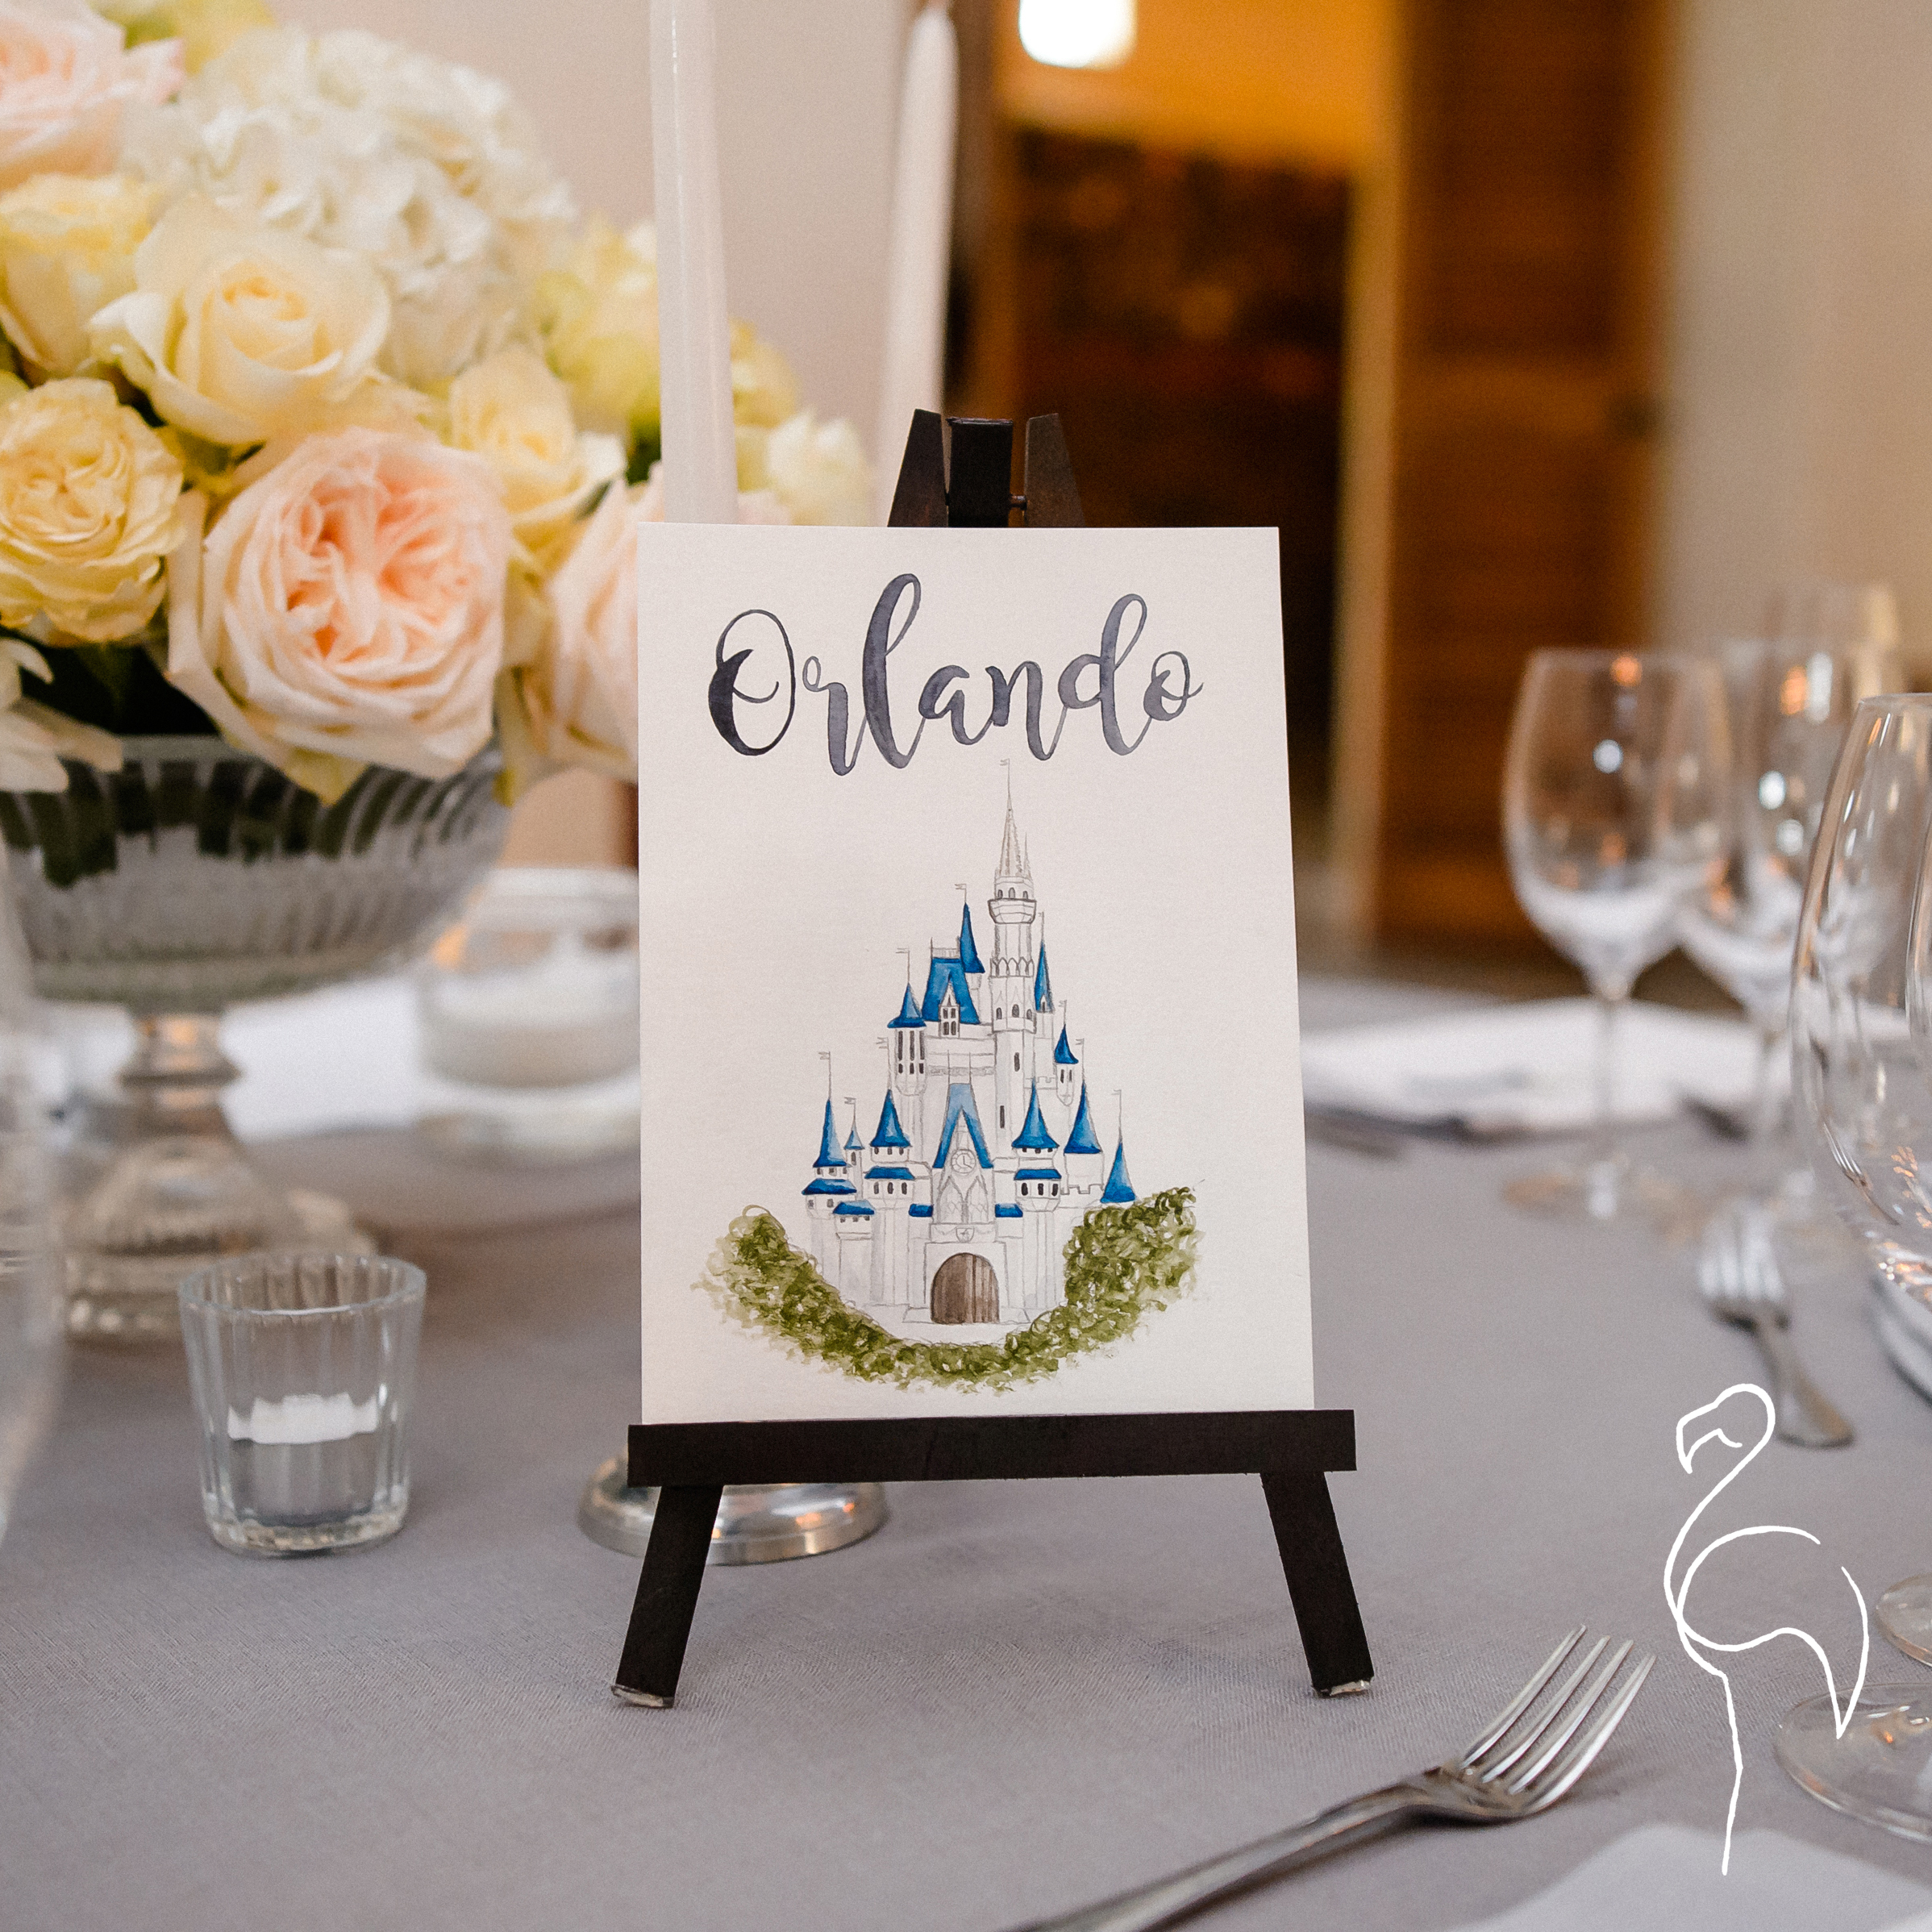 Brazzlebird - Classic Collection Watercolor Orlando Disney Castle Table Sign.jpg